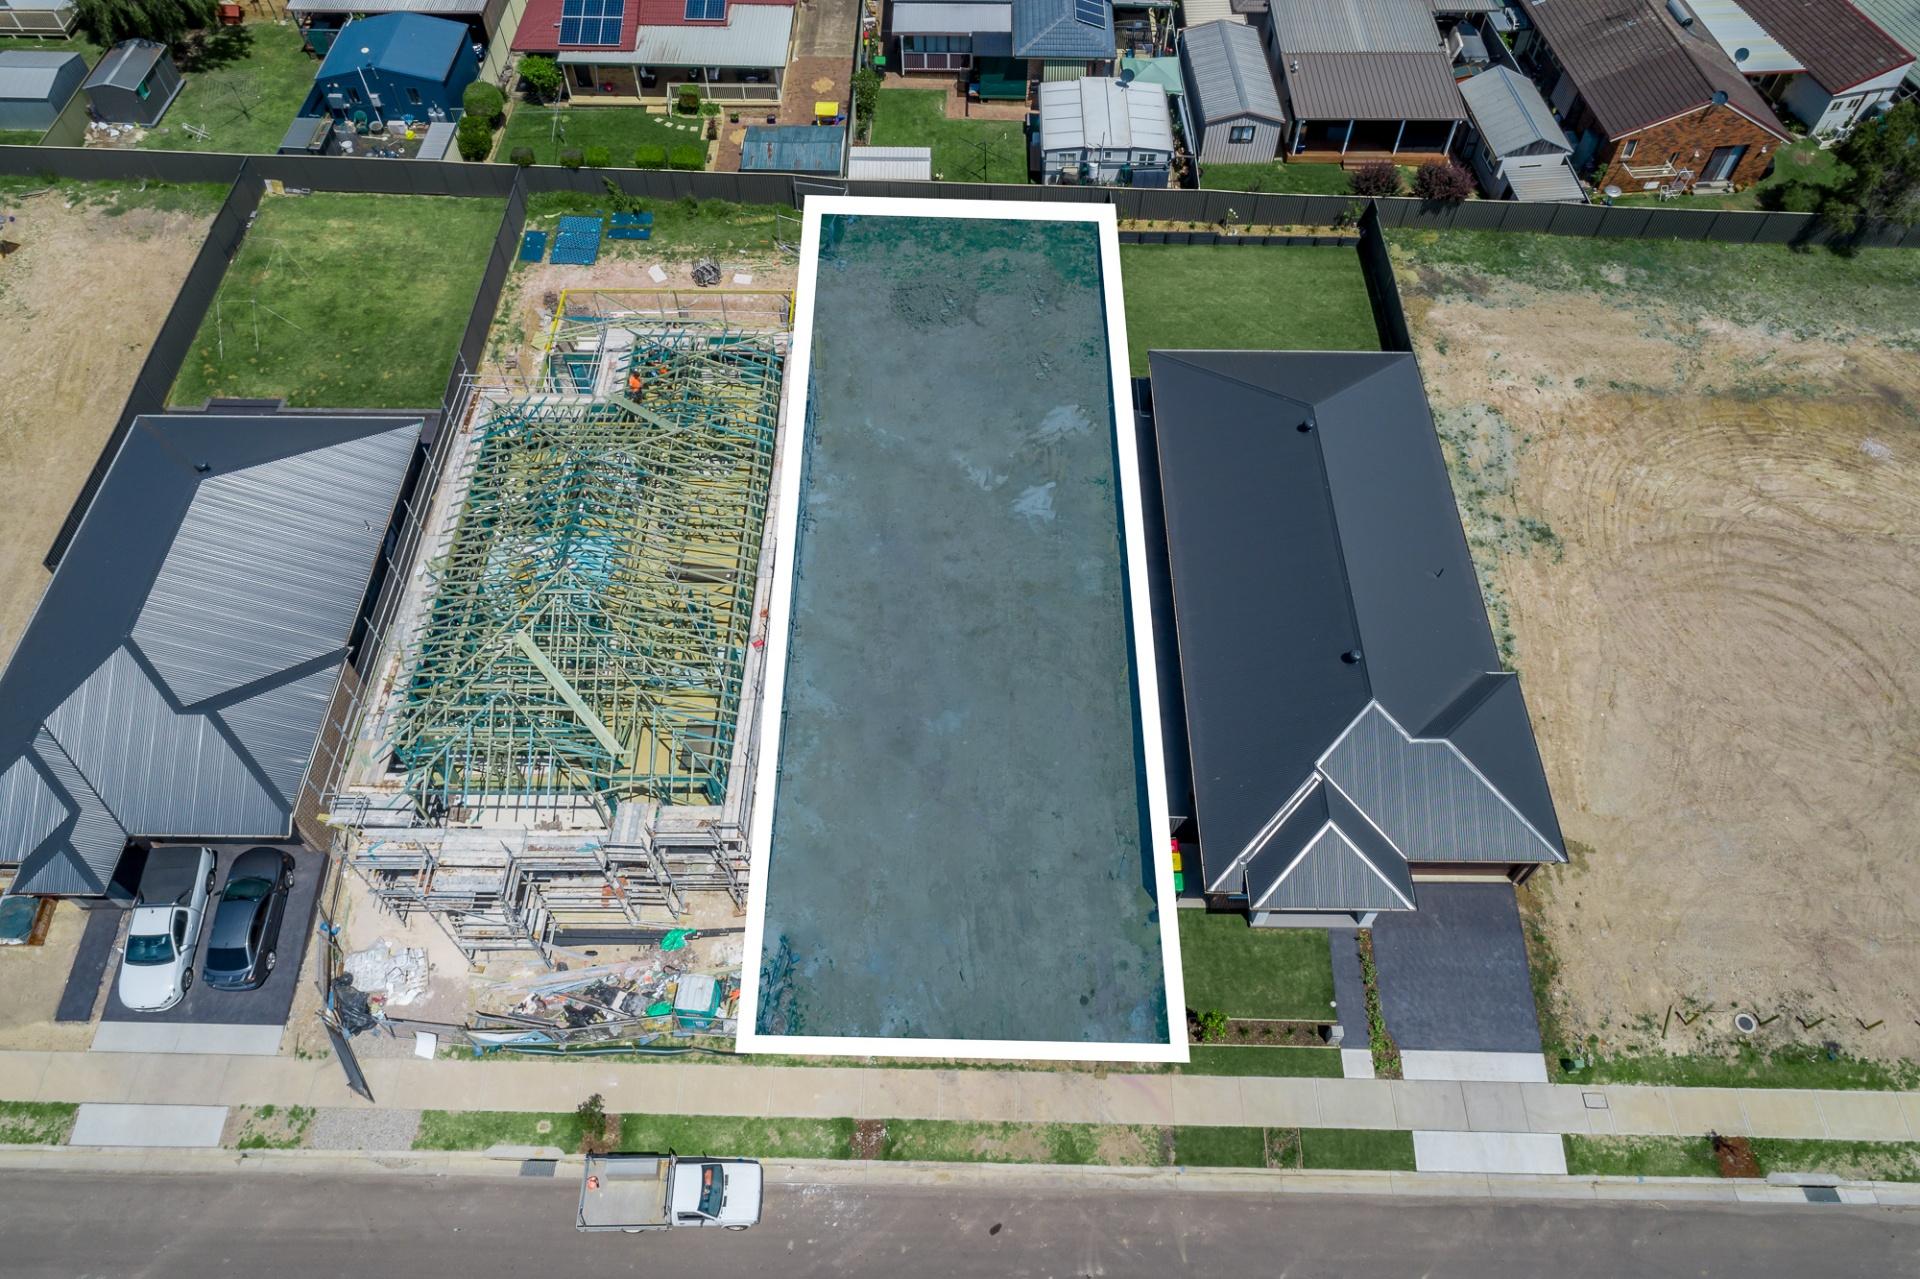 Land, Sold , Epaulet Circuit , Listing ID 1346, Jordan Springs, NSW, Australia,